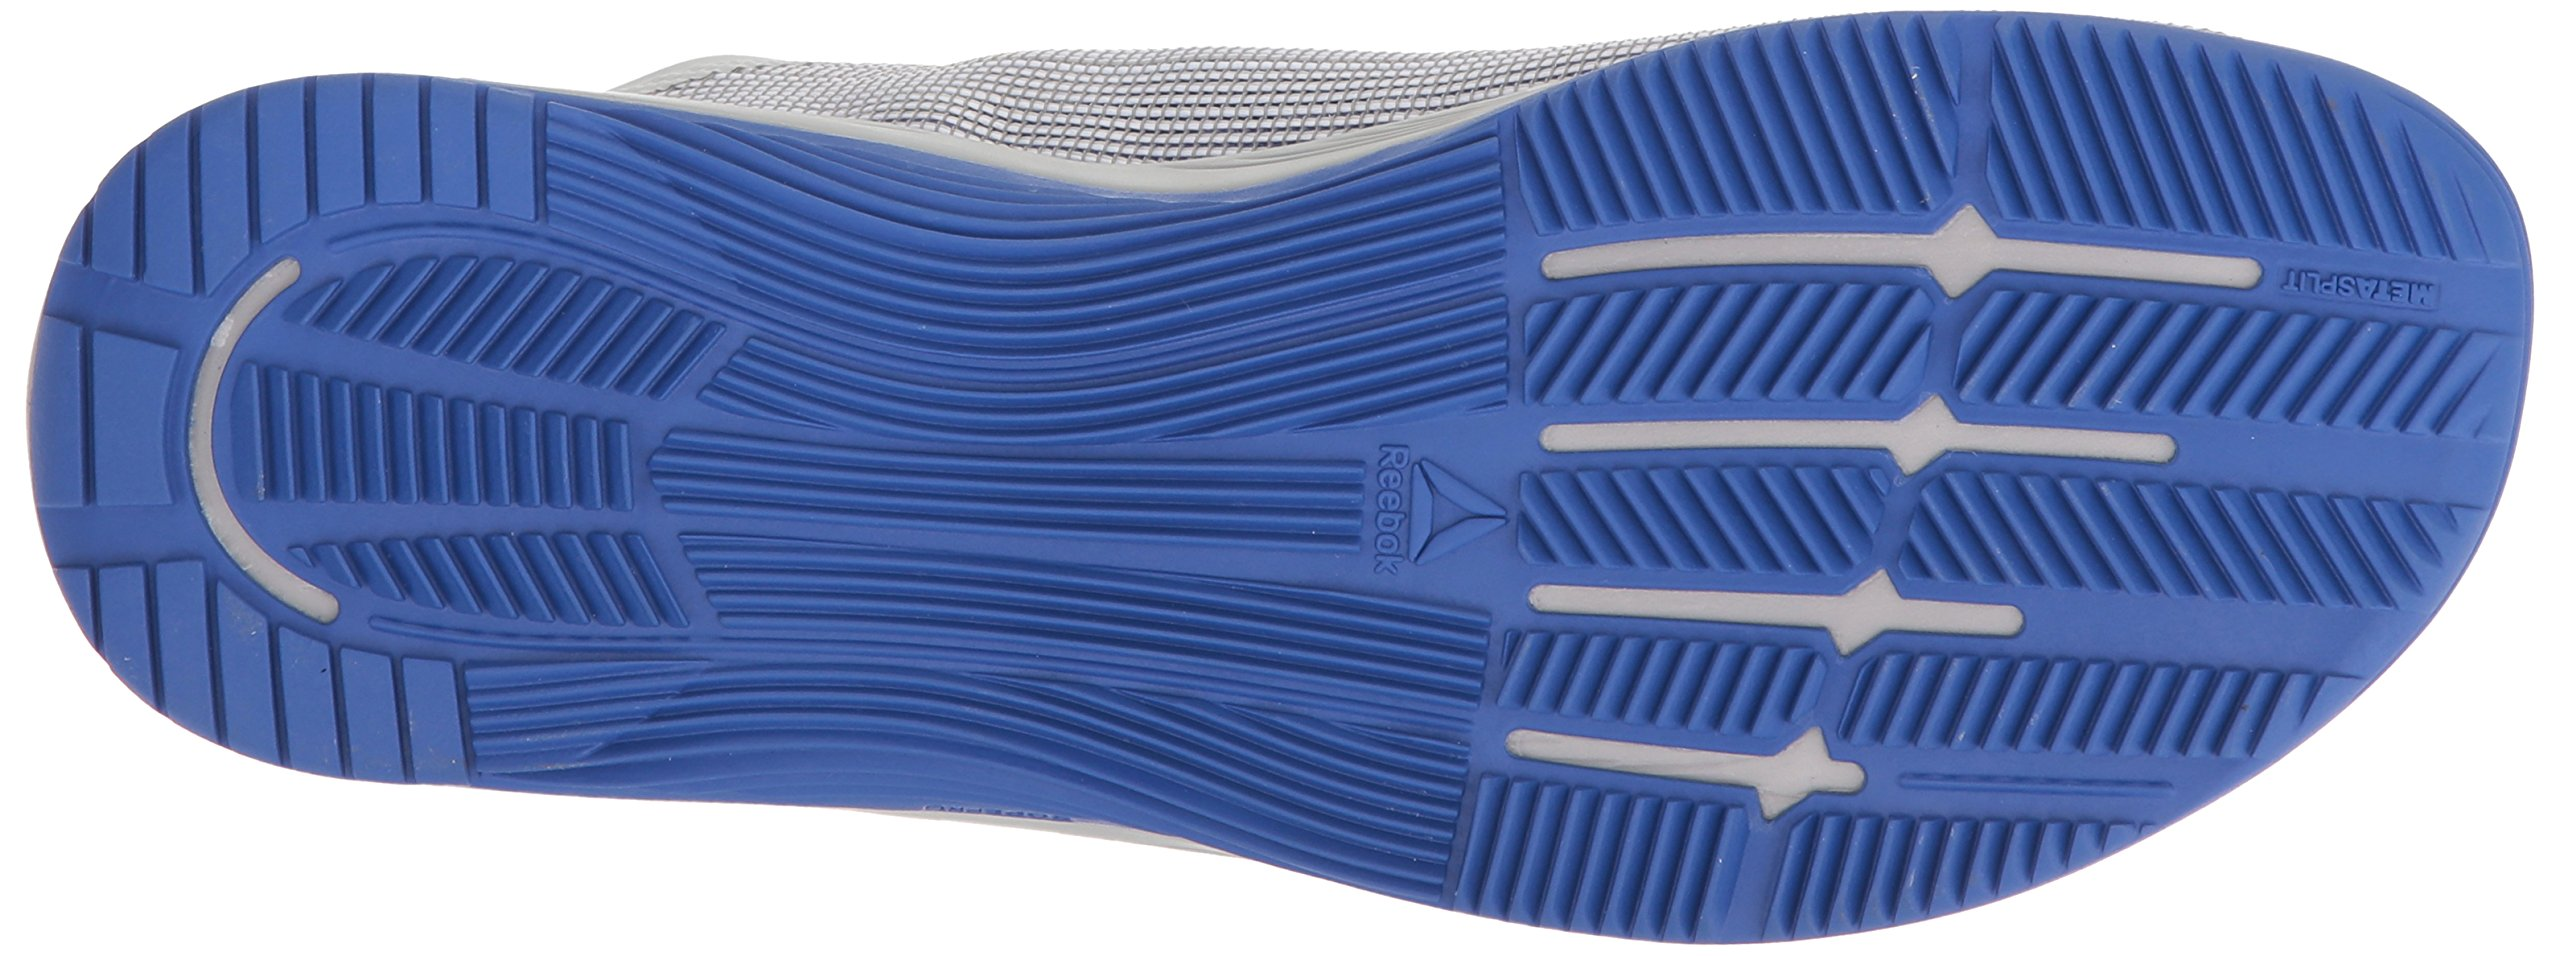 Reebok Men's CROSSFIT Nano 8.0 Sneaker, White/Stark Grey/Skull GR, 6.5 M US by Reebok (Image #3)